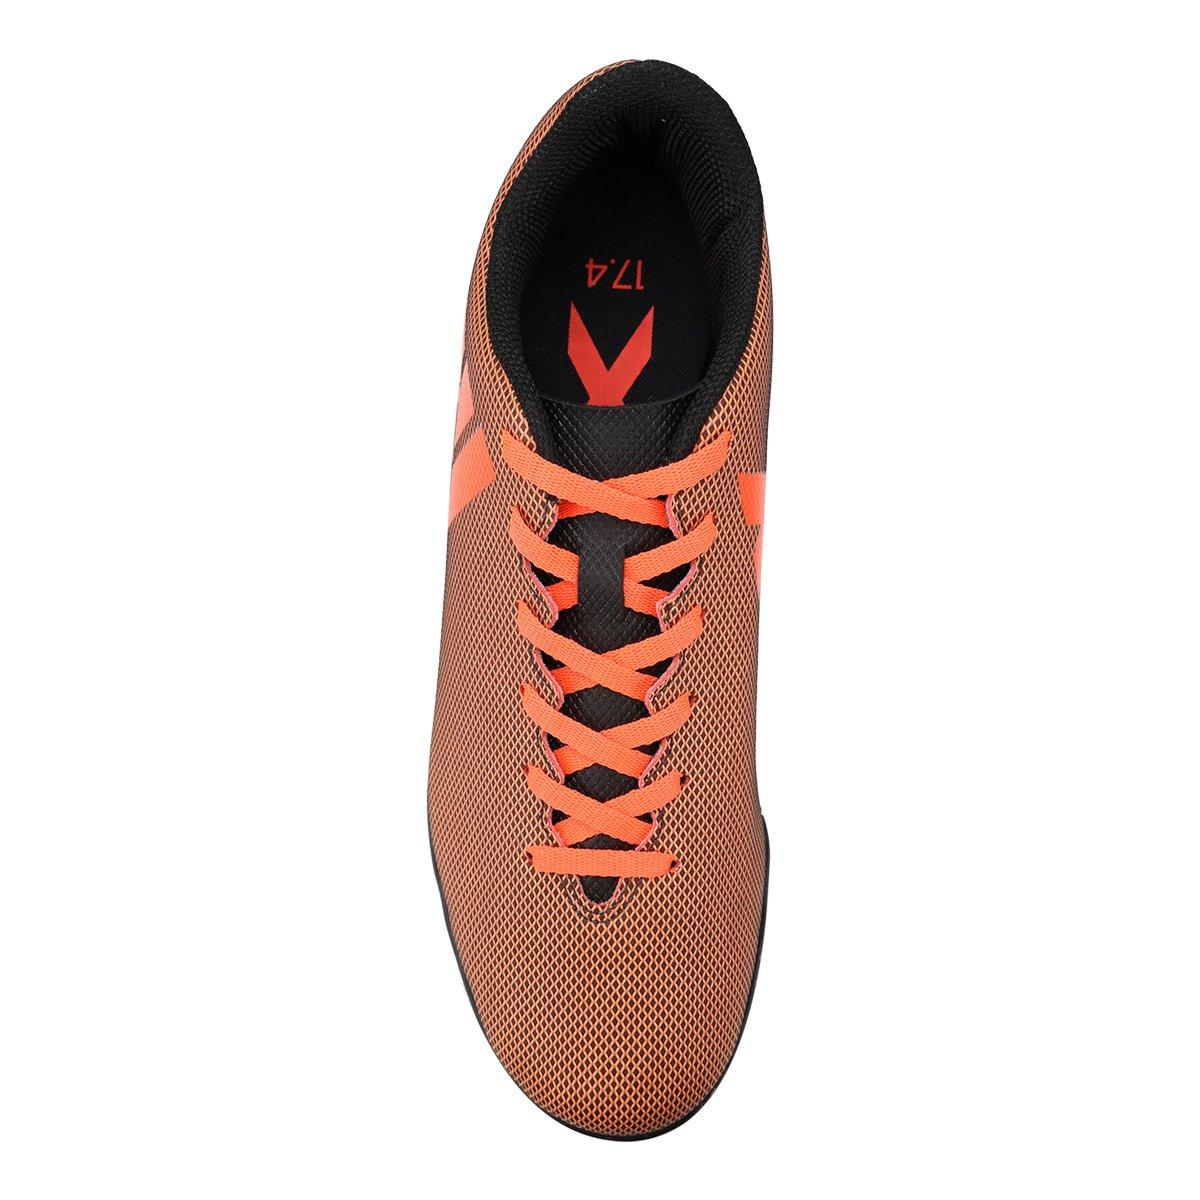 Chuteira Society Adidas X 17.4 TF - Preto - Compre Agora  81b052023c18f